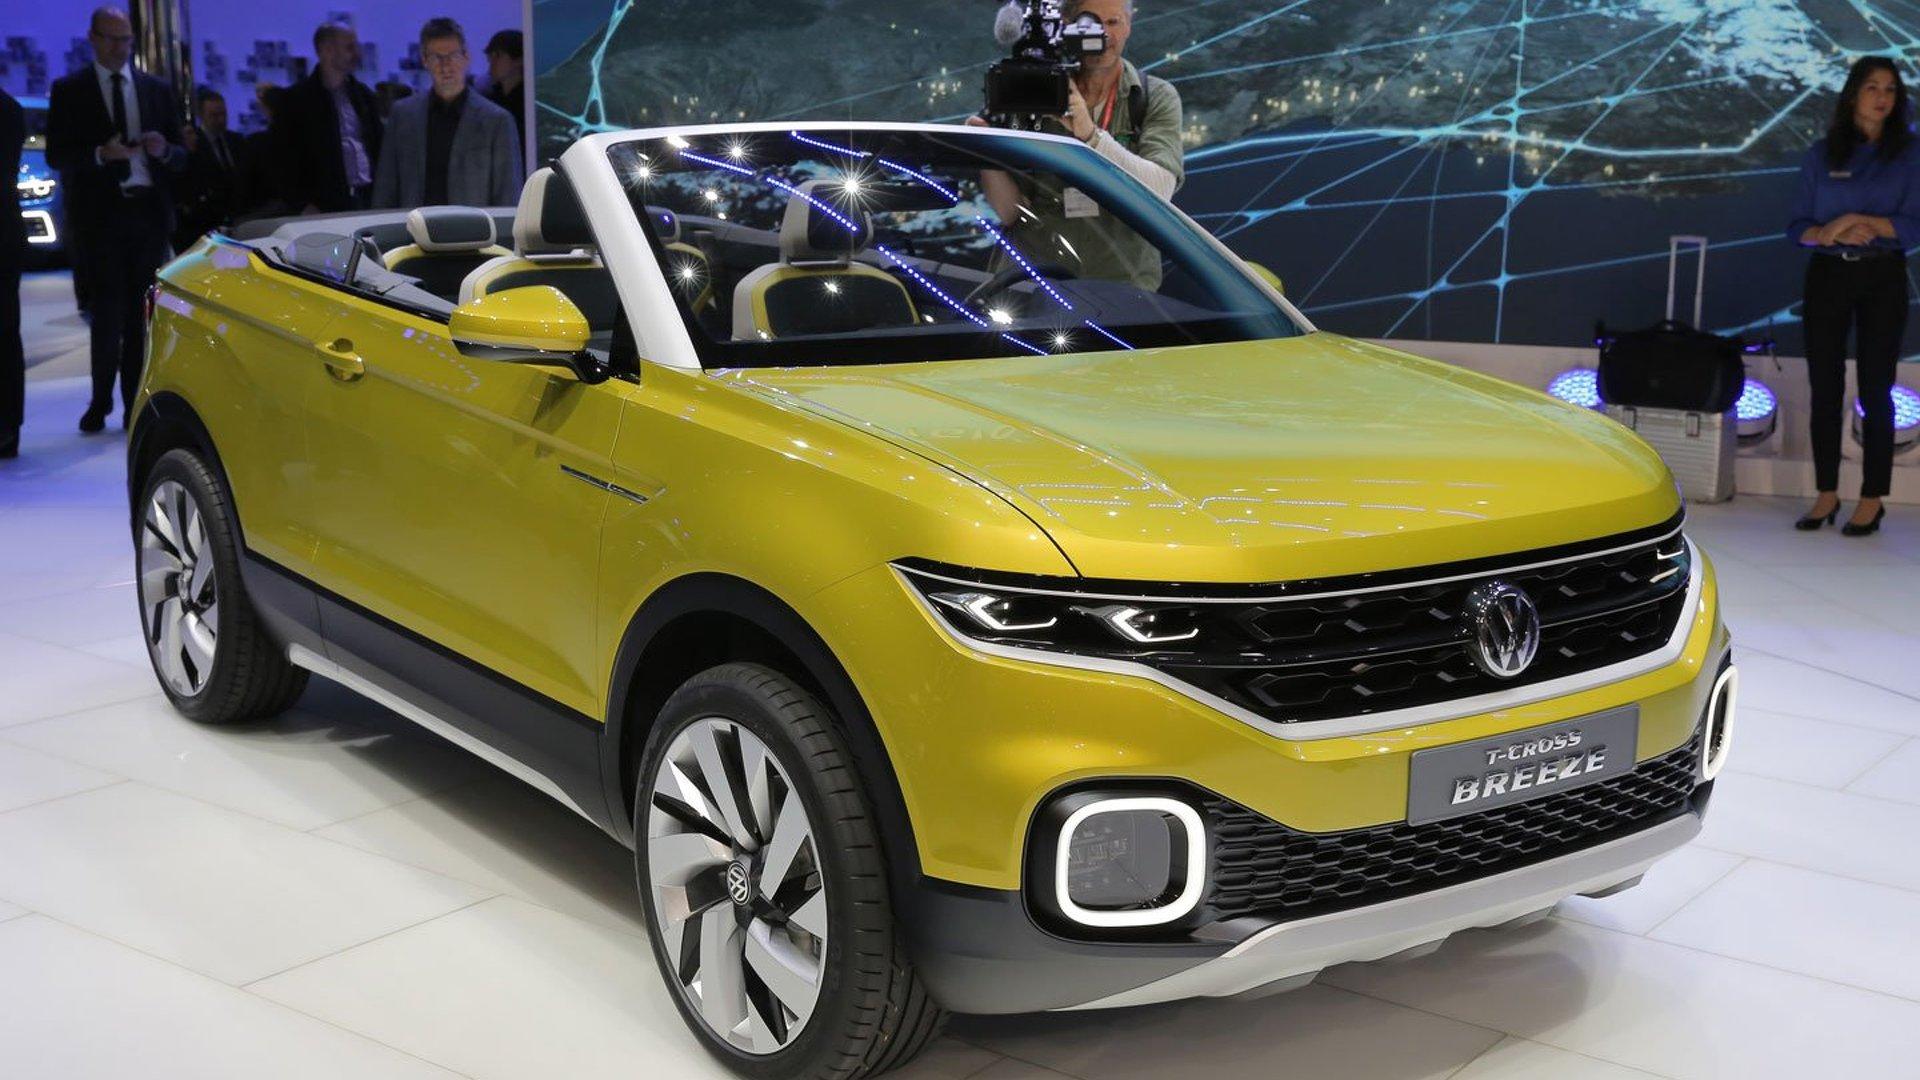 VW T-Cross Breeze concept previews small crossover cabrio